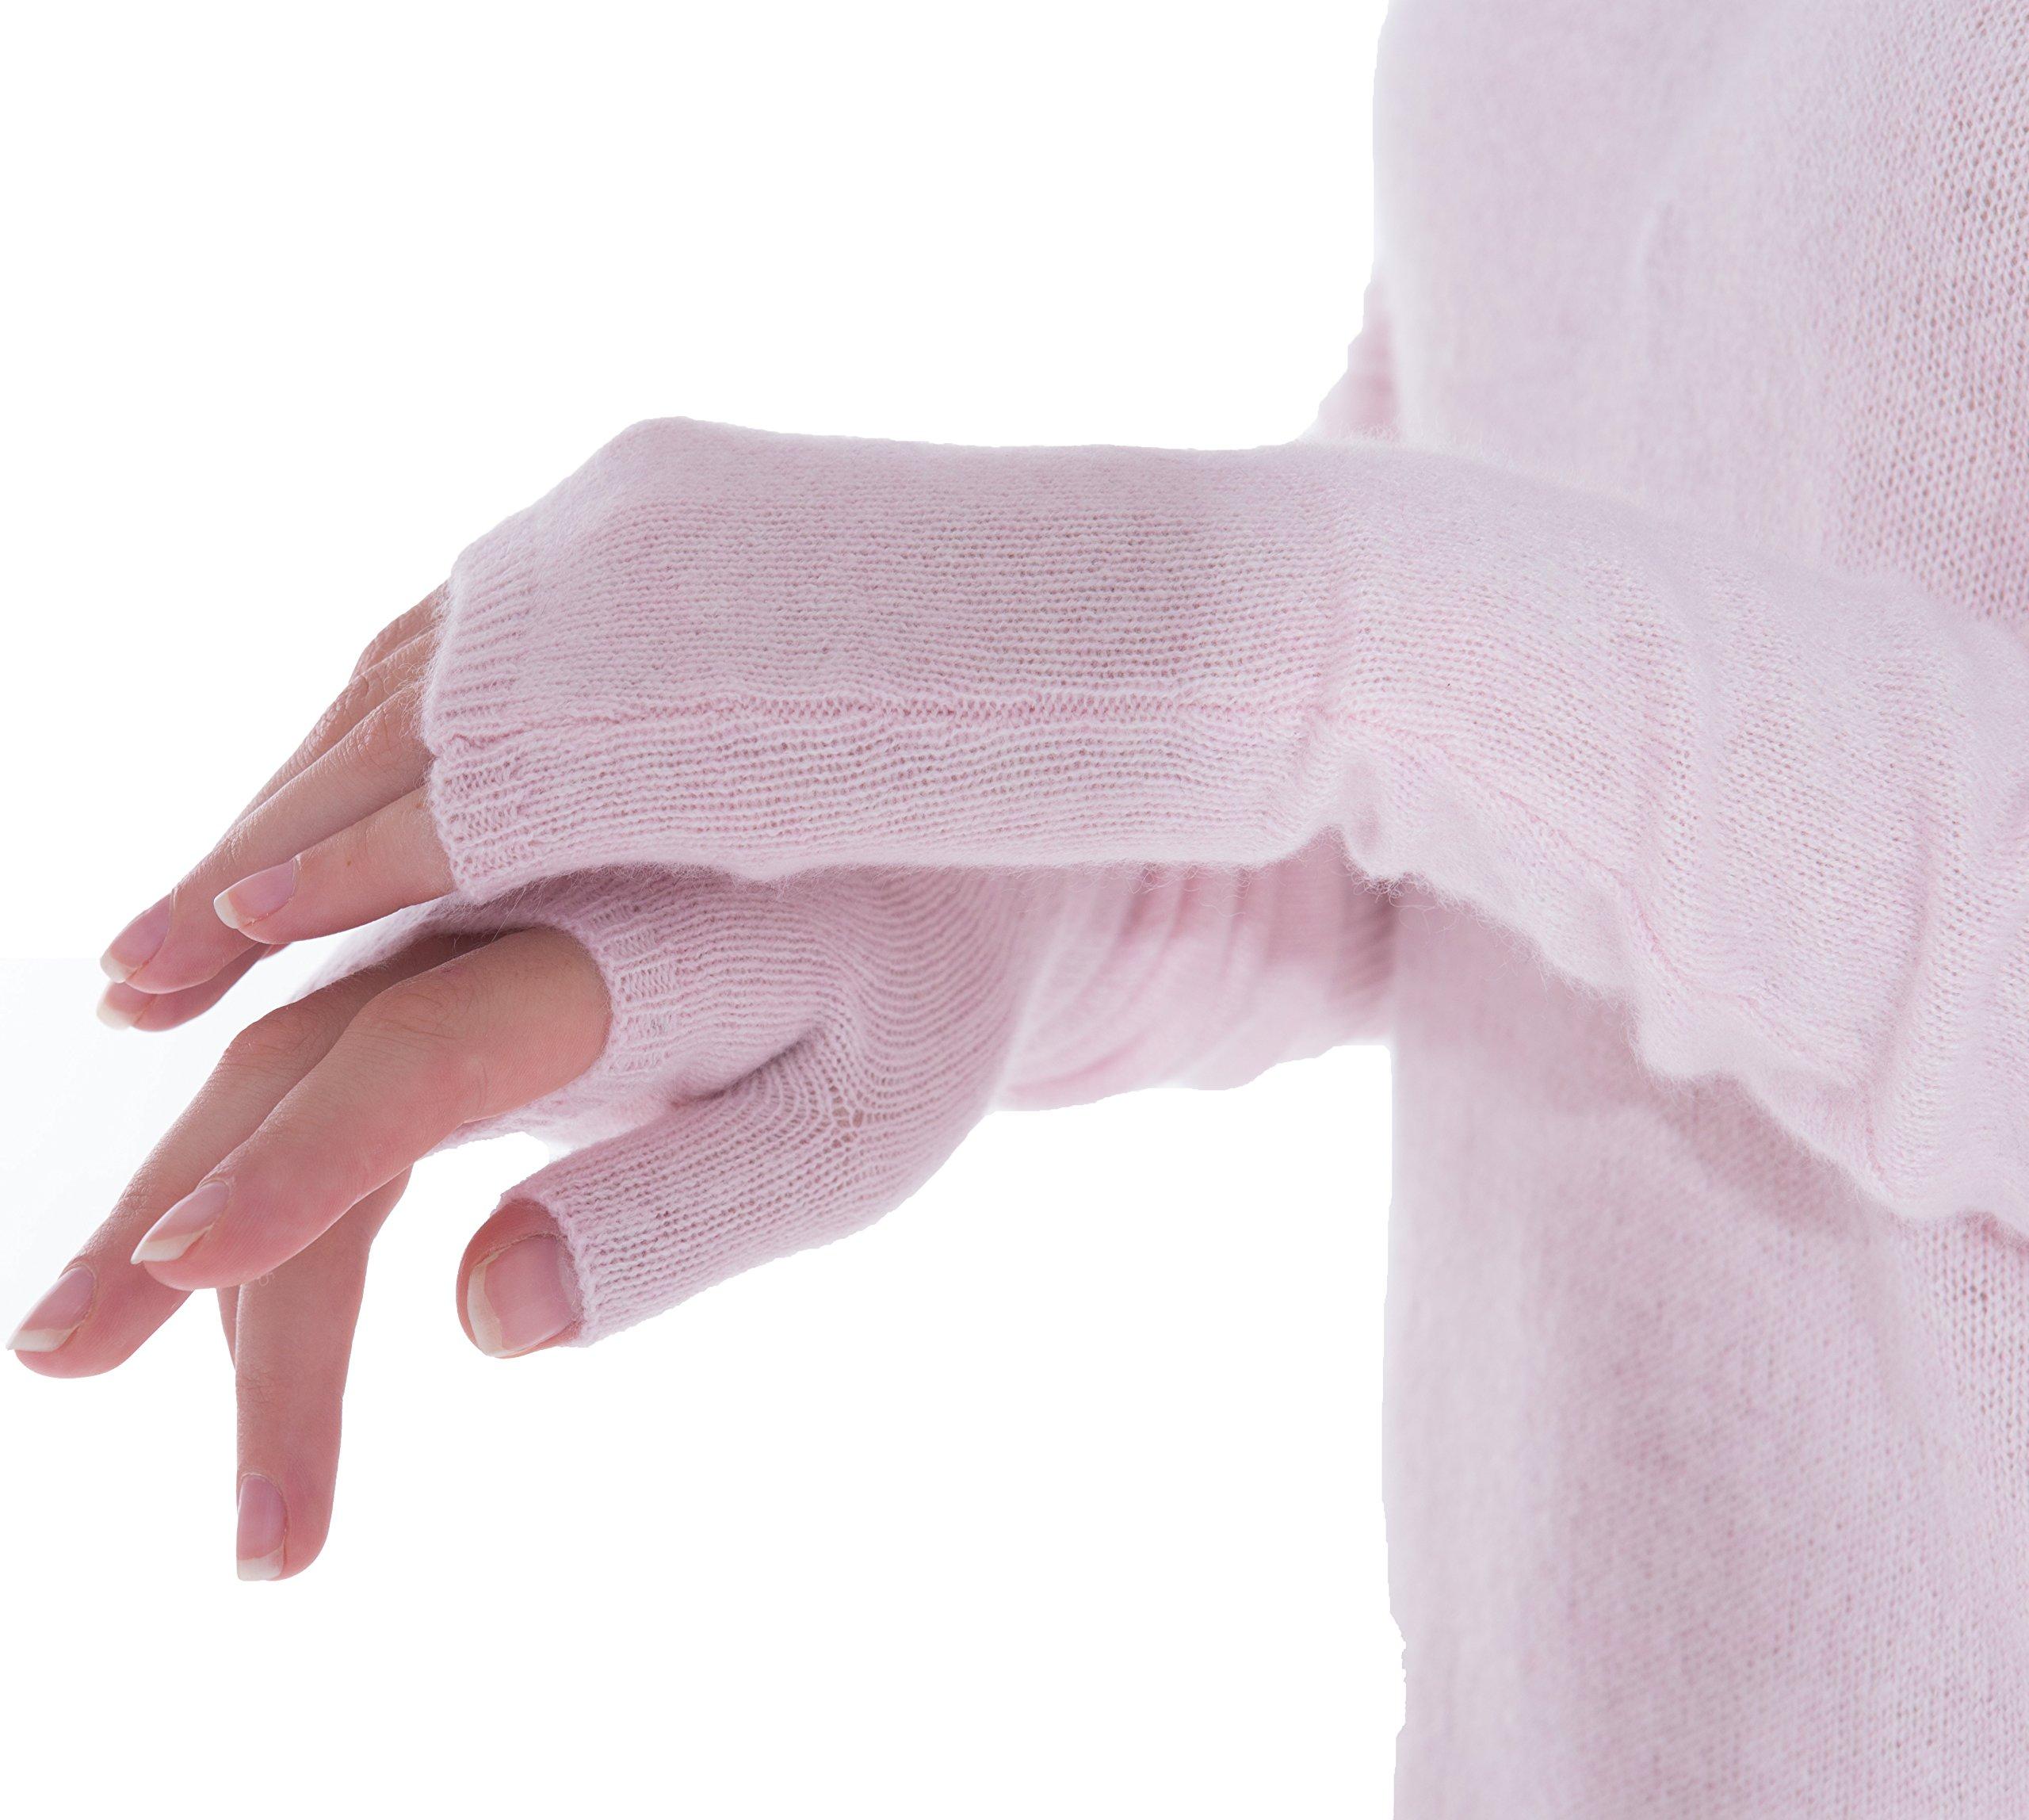 cashmere 4 U Women's 100% Cashmere Long Sleeve Fingerless Mitten Gloves (Givre) by cashmere 4 U (Image #4)